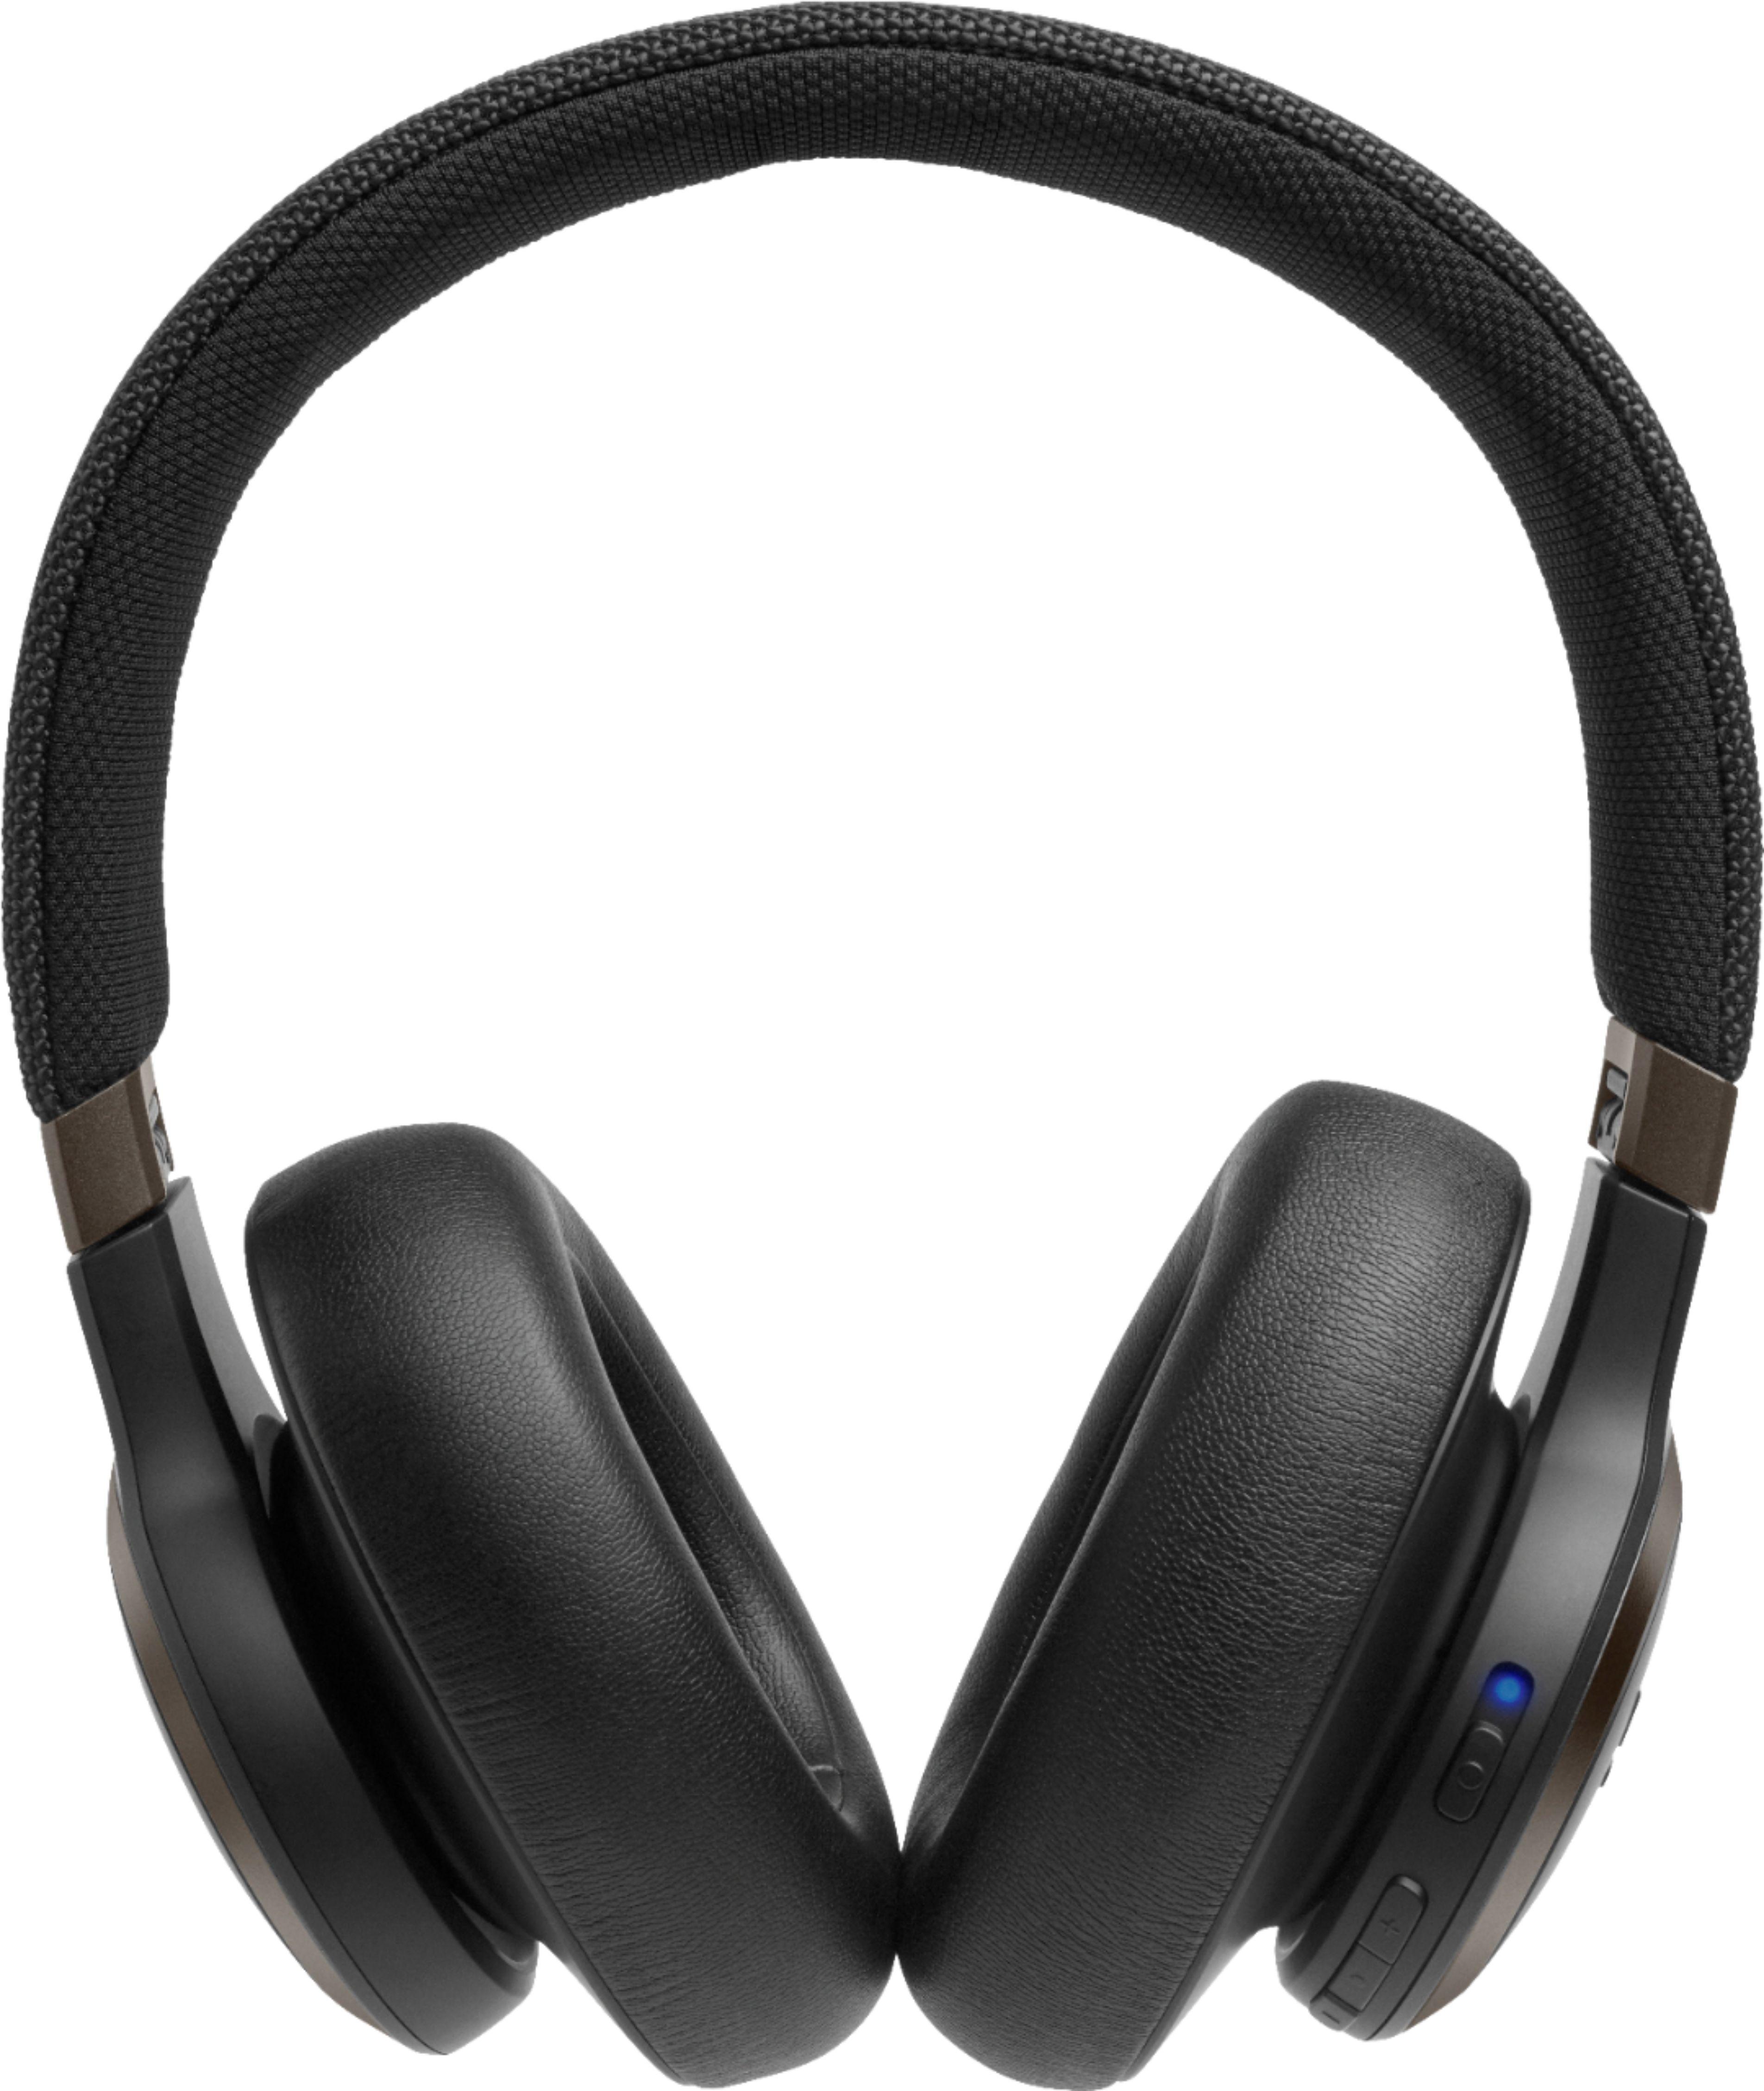 JBL LIVE 650BTNC Wireless Noise Cancelling OvertheEar